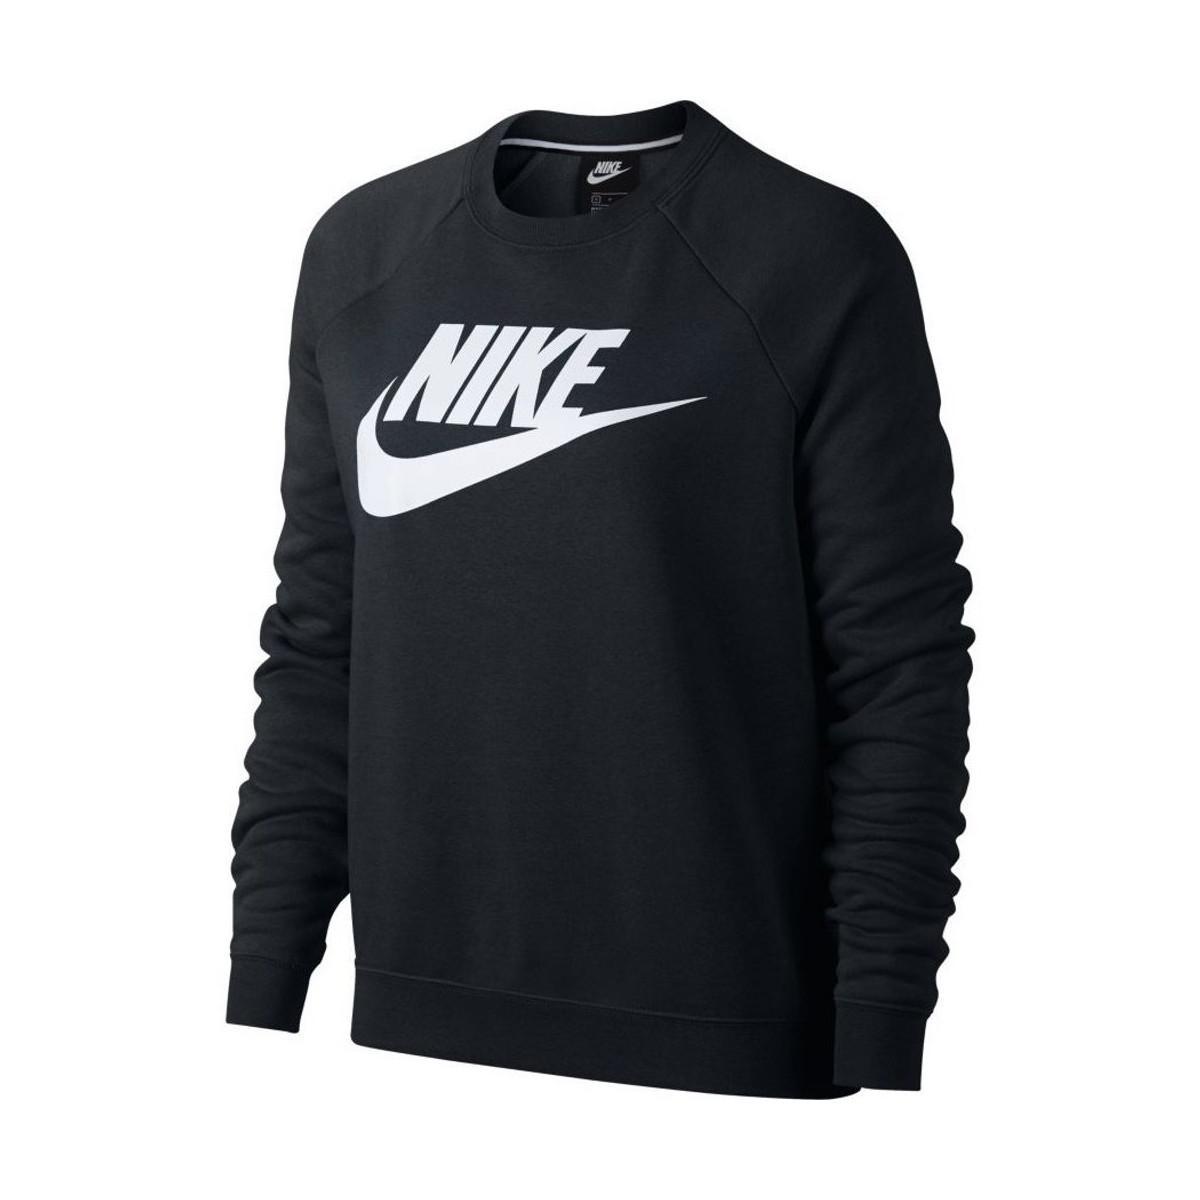 Nike Sweatshirt Black Crew In Lyst Rally Zwv8vrwhp Women's Sportswear 5wnwxZA